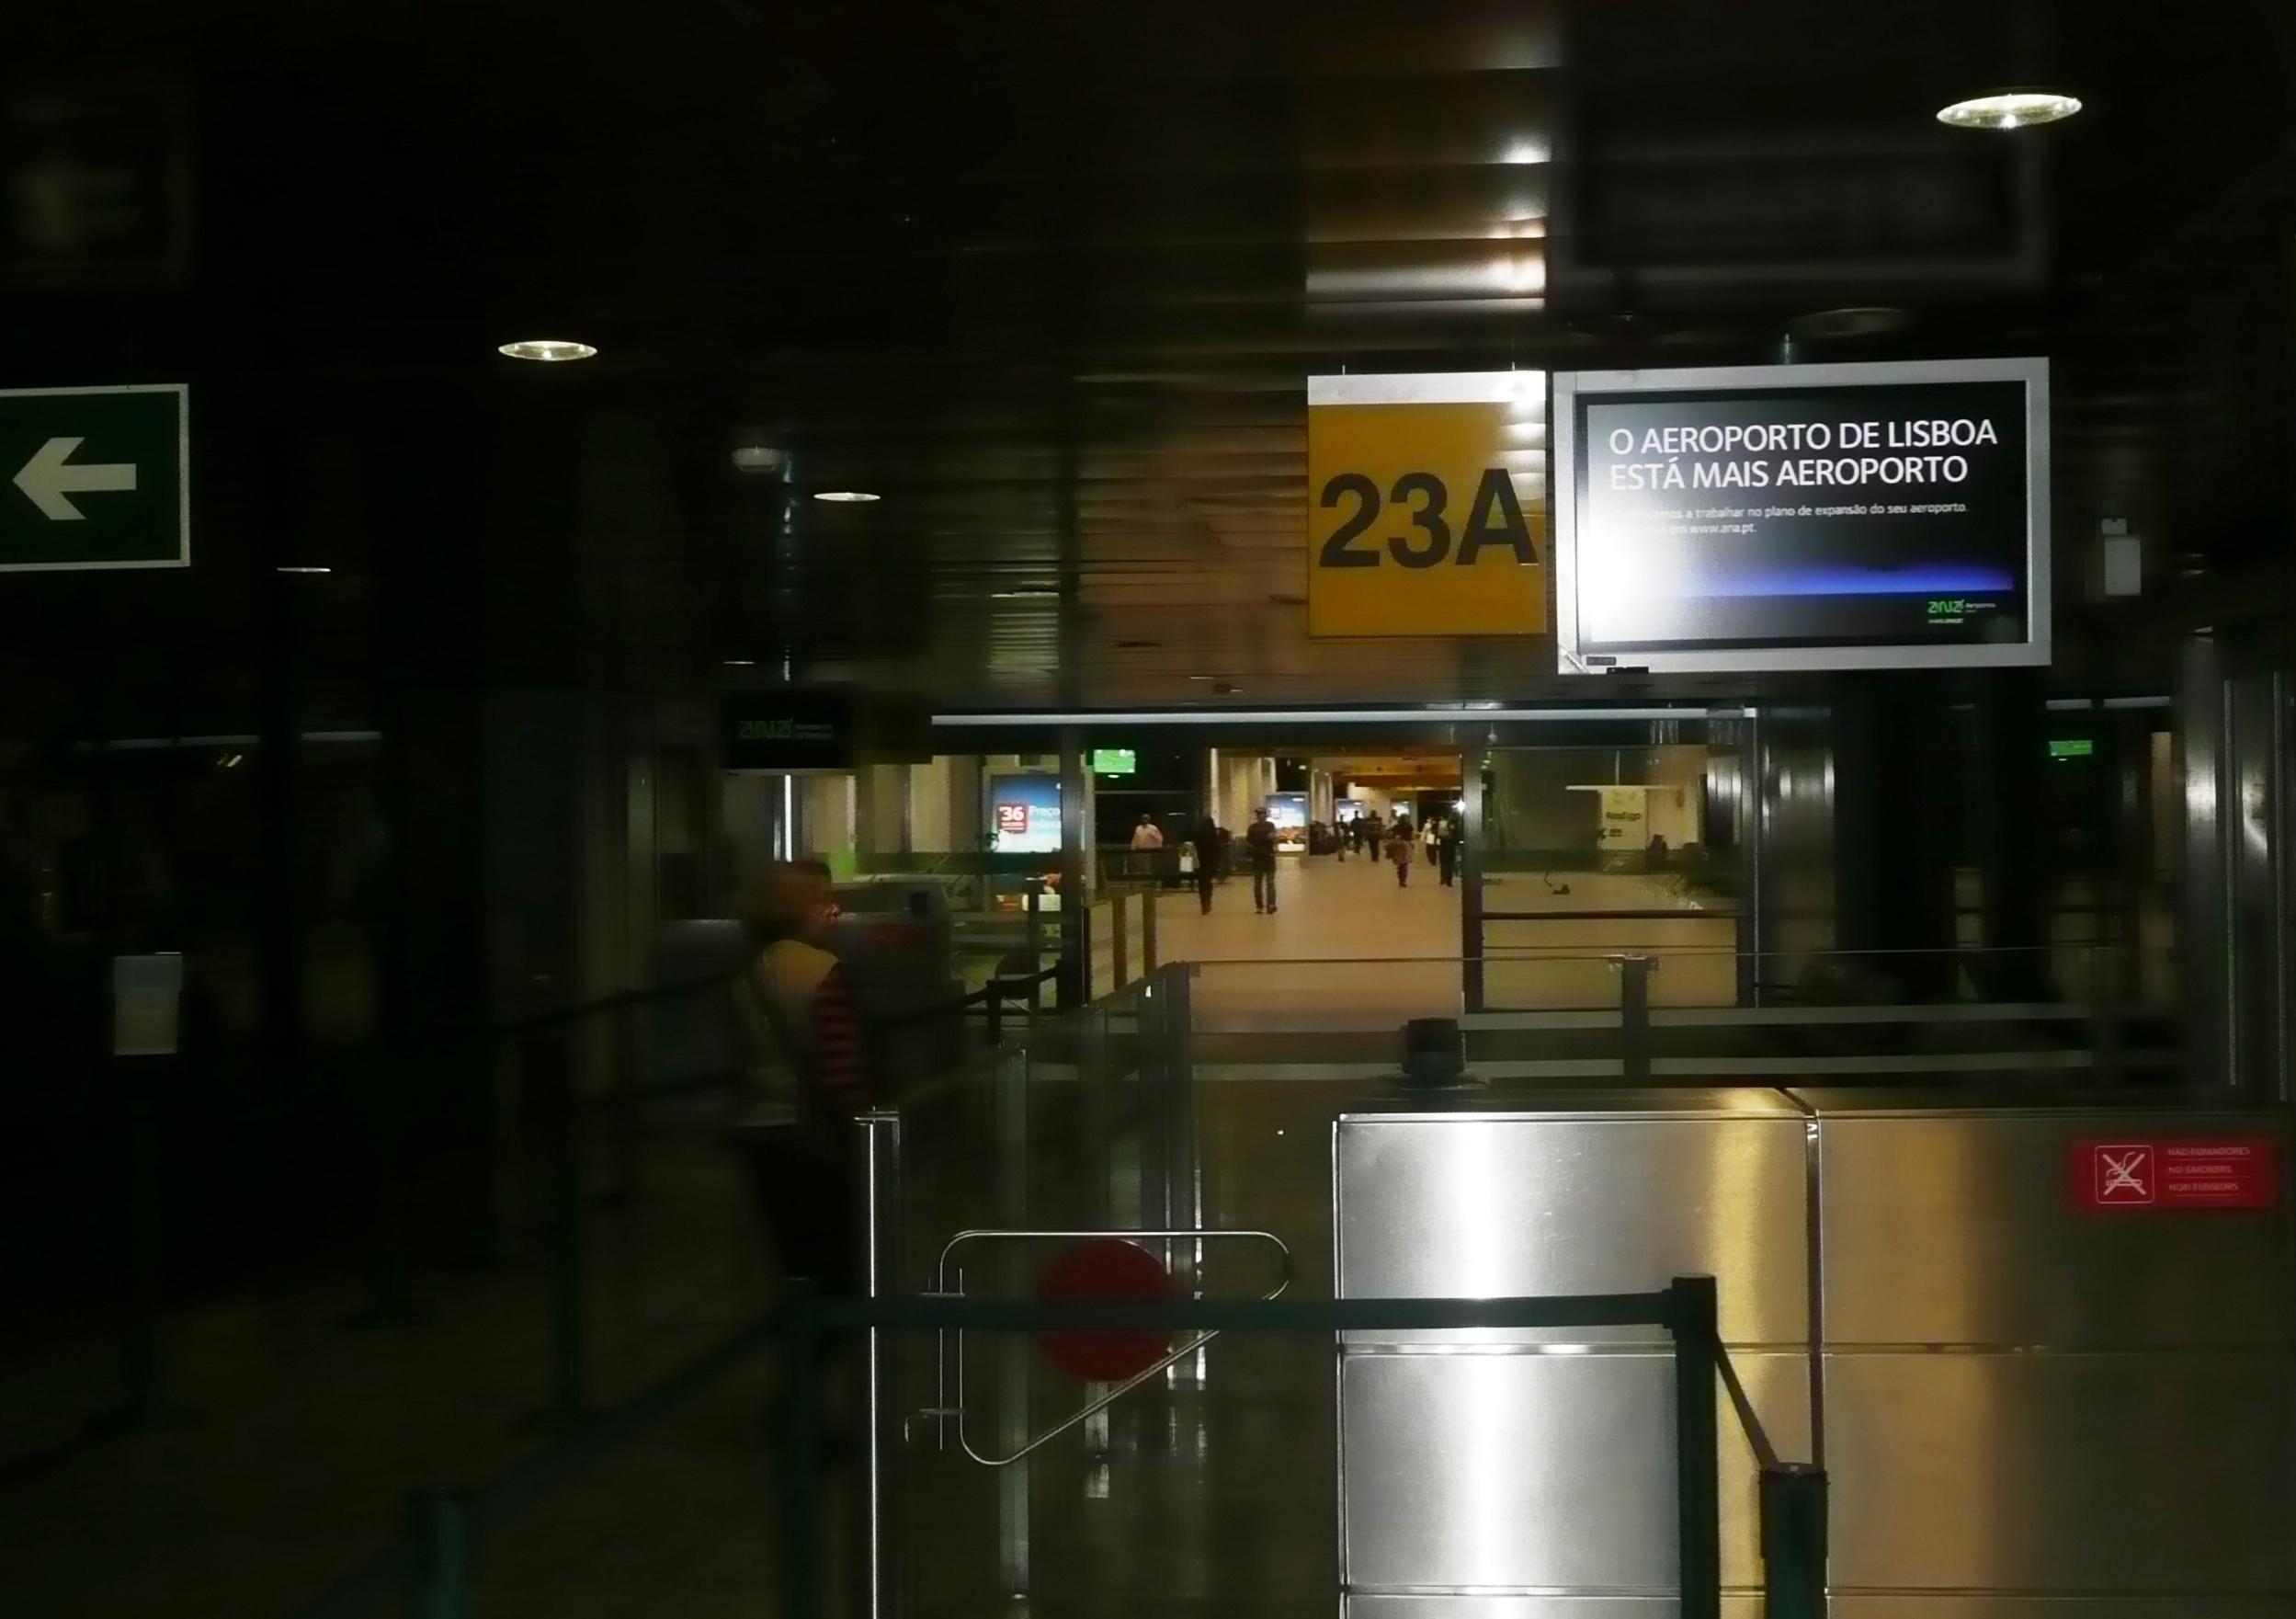 Aeroporto de Lisboa - photo by Mamcasz